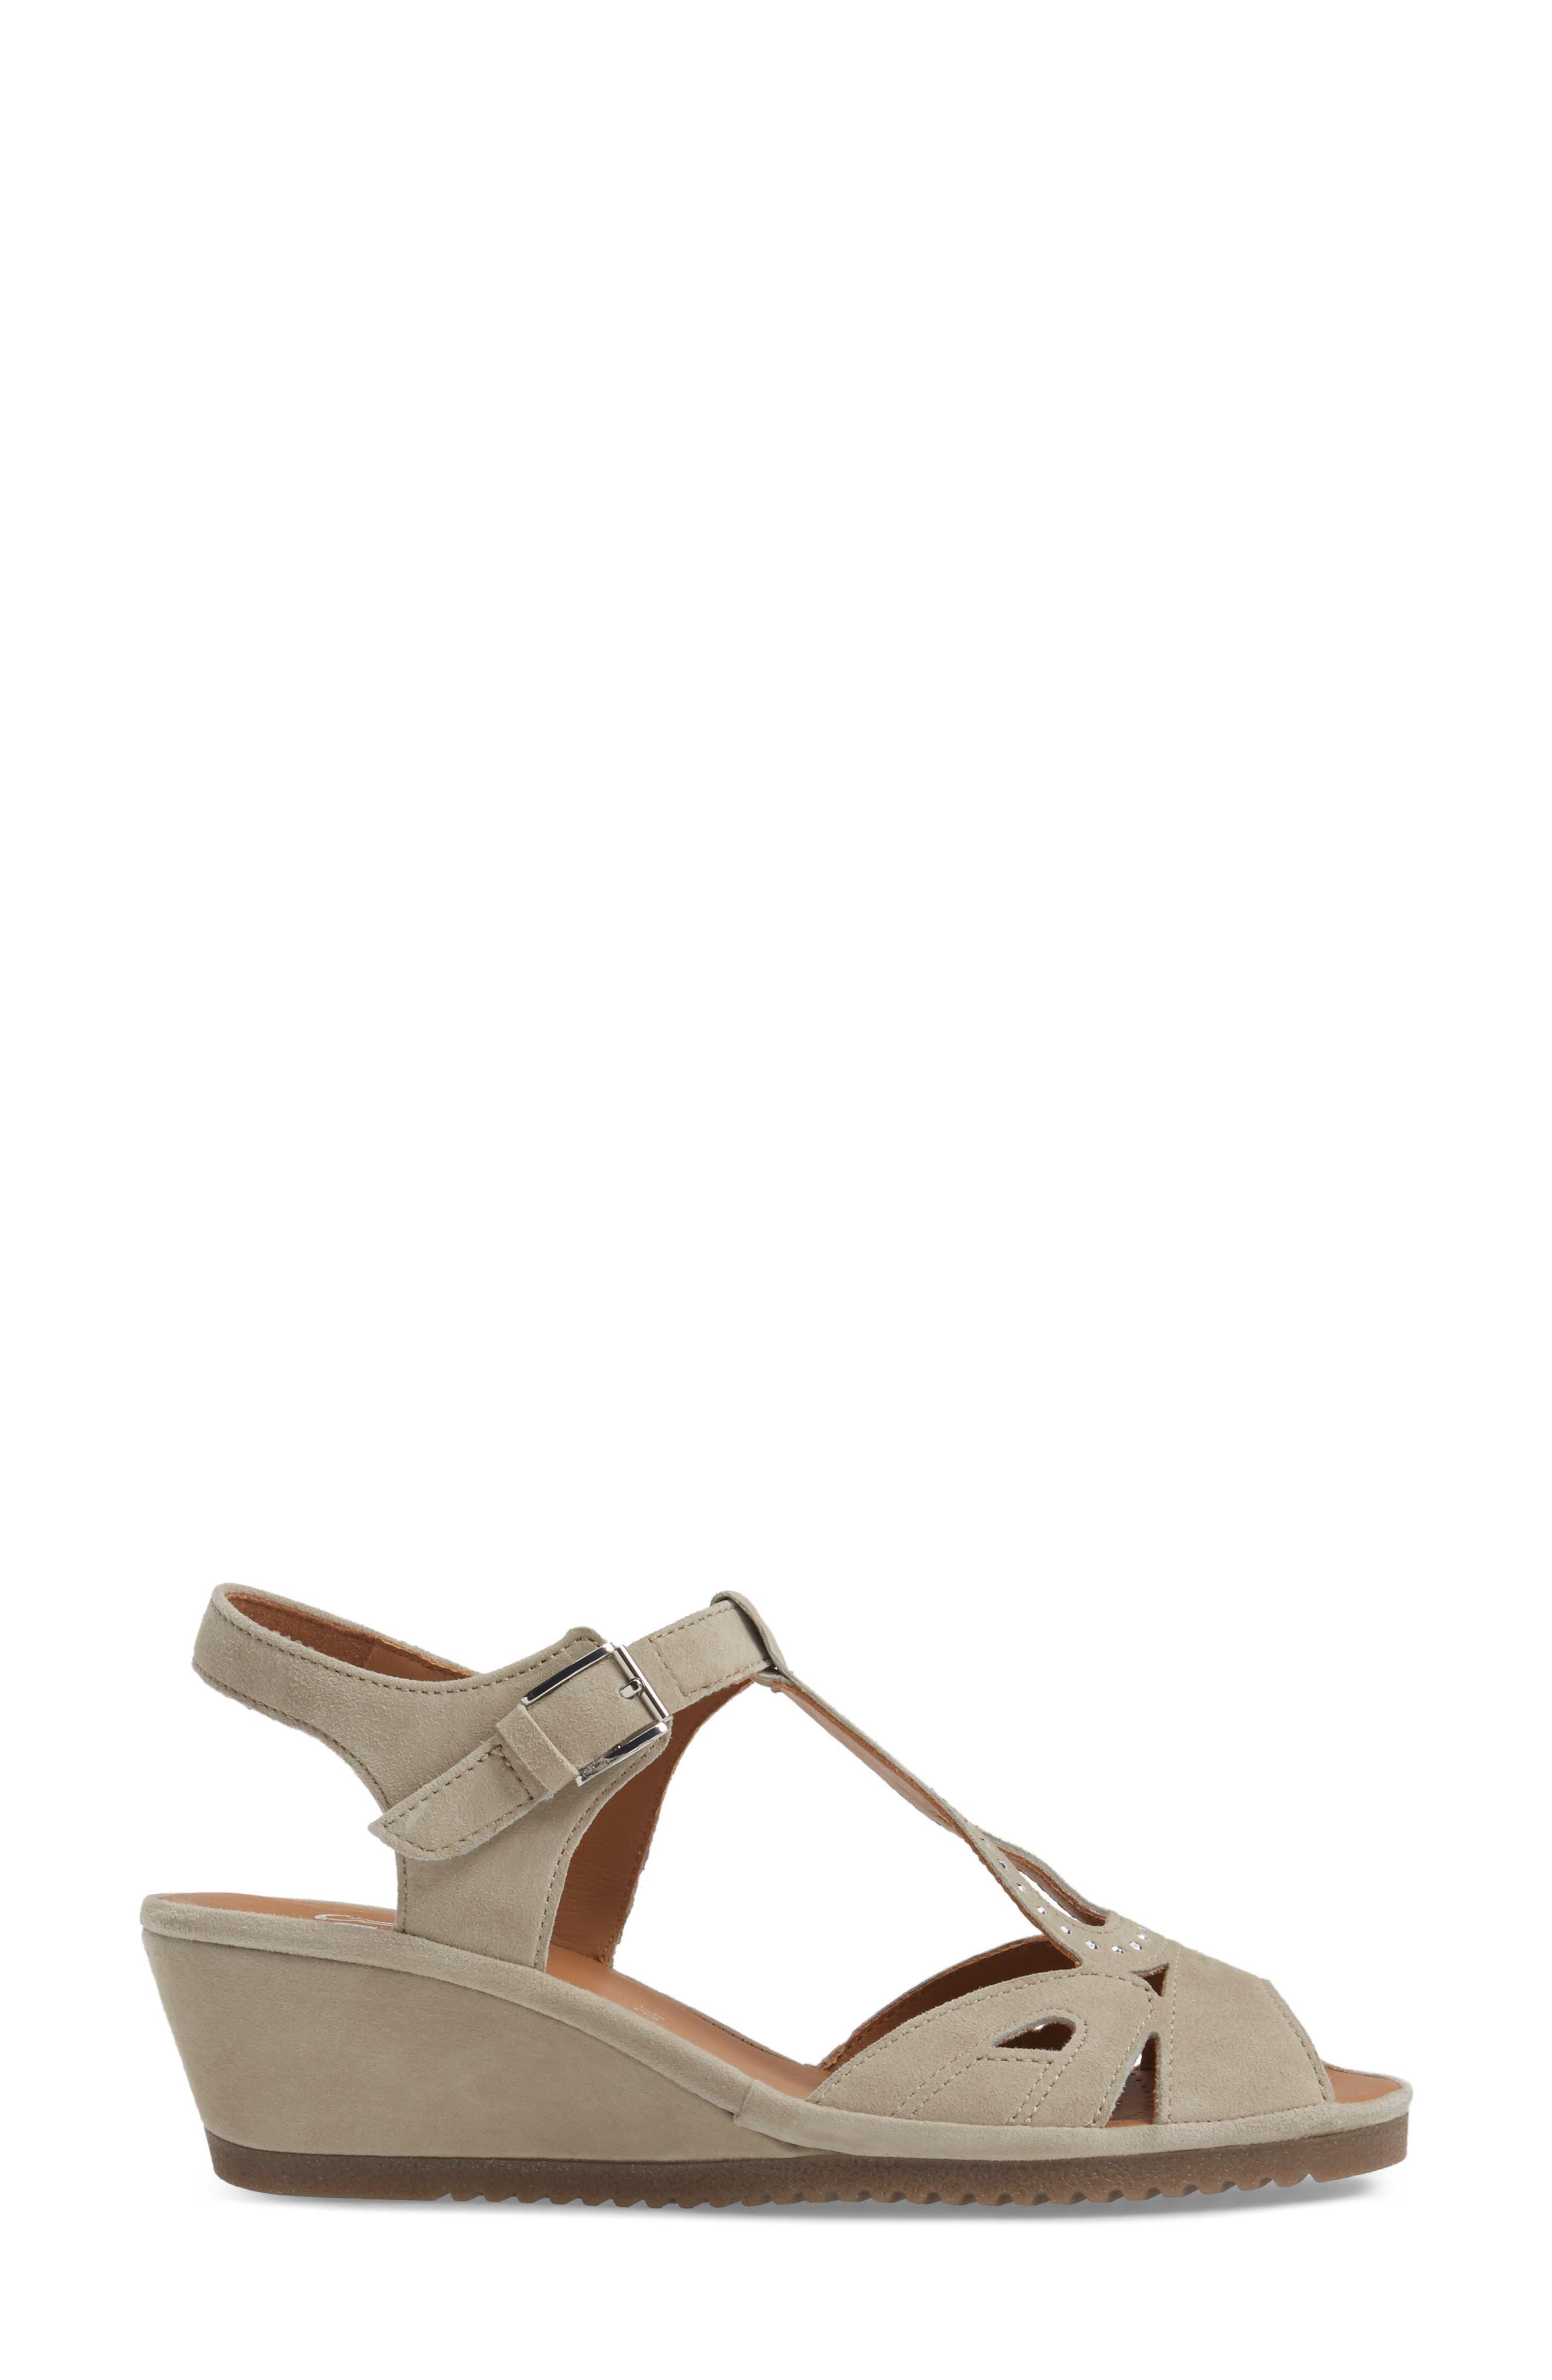 Alternate Image 3  - ara Wedge Sandal (Women)